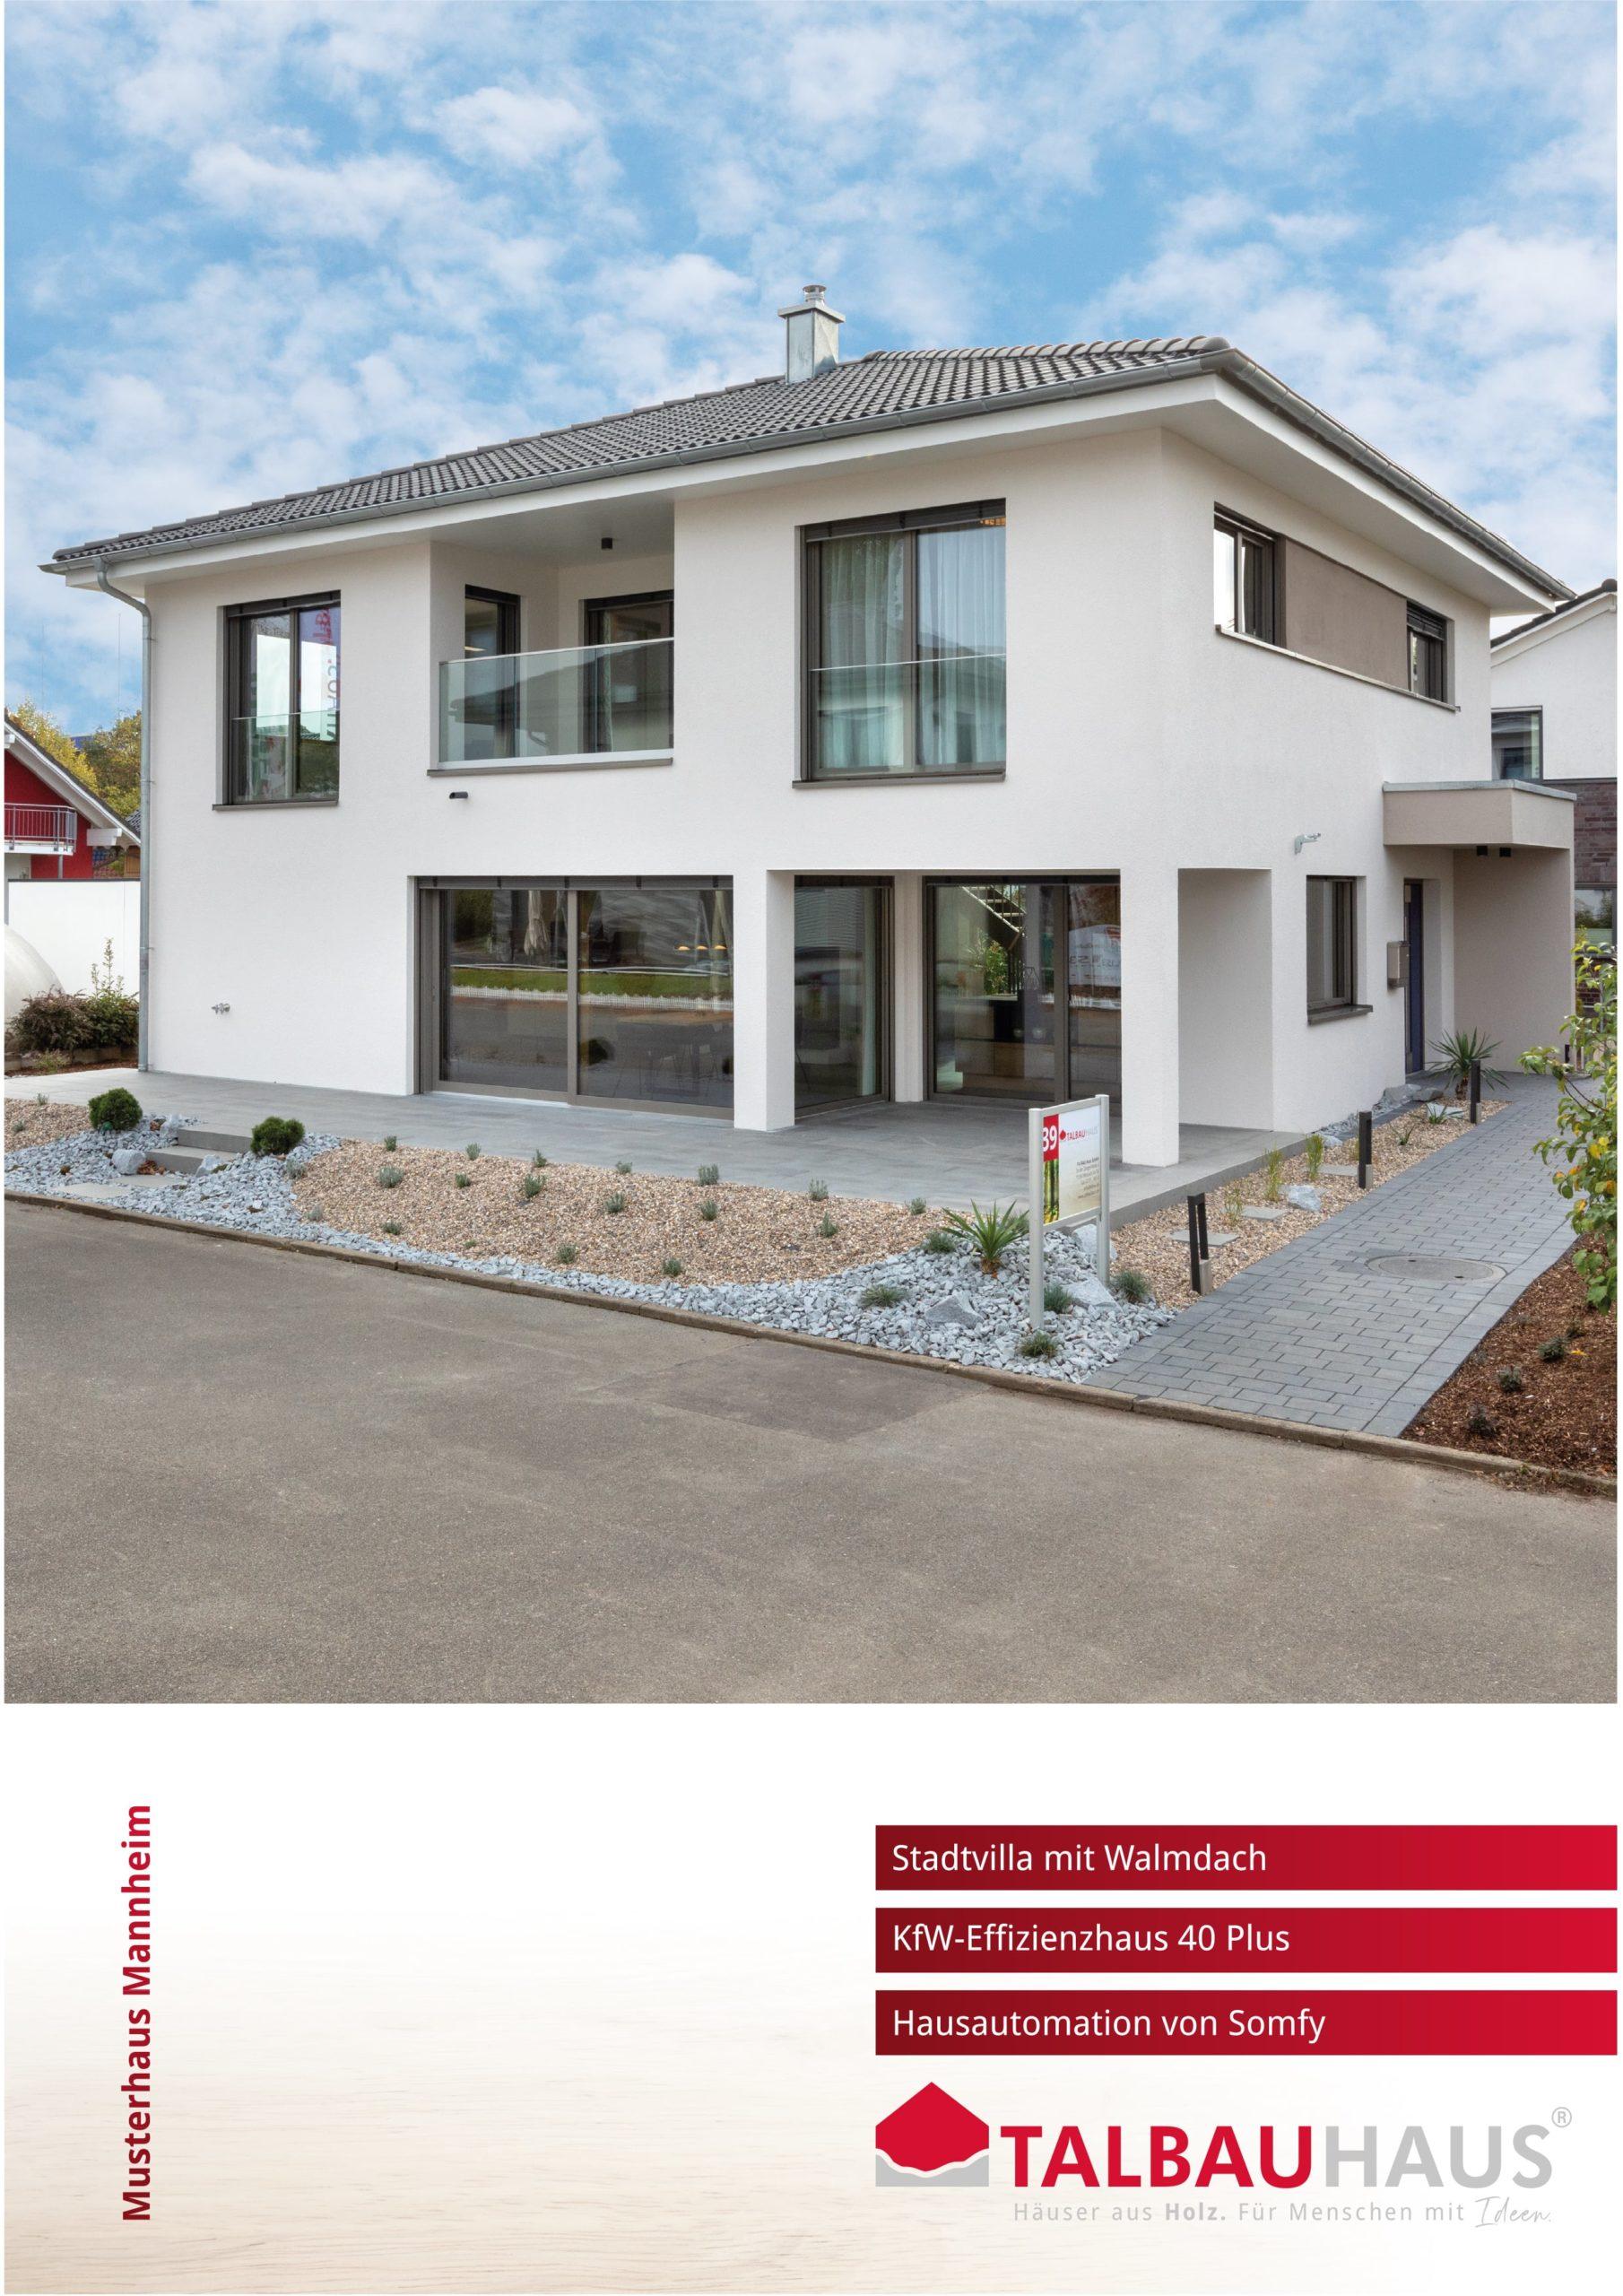 Musterhaus Mannheim download prospekt infomaterial TALBAU-Haus downloads